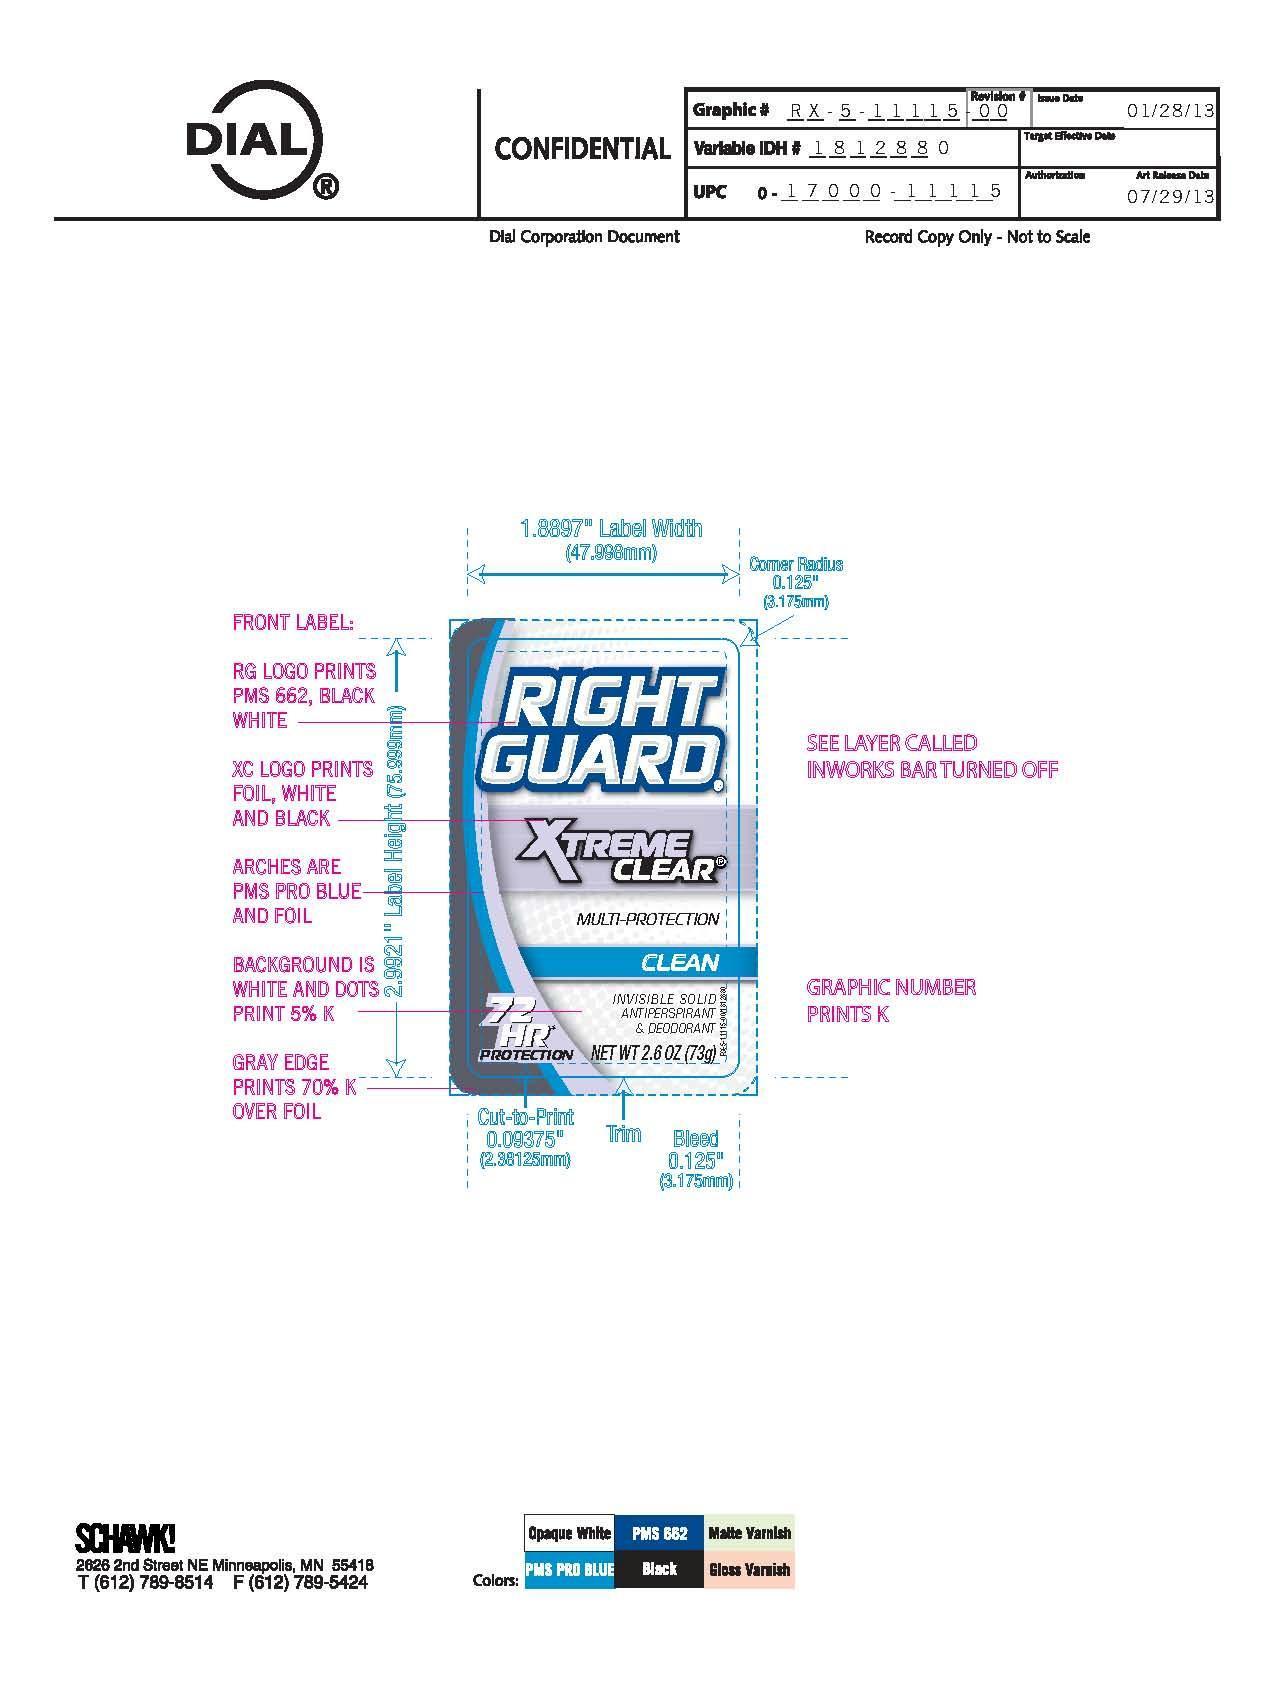 Right Guard Xtreme Clear Clean (Aluminum Zirconium Tetrachlorohydrex) Stick [Vvf Illinois Services Llc]